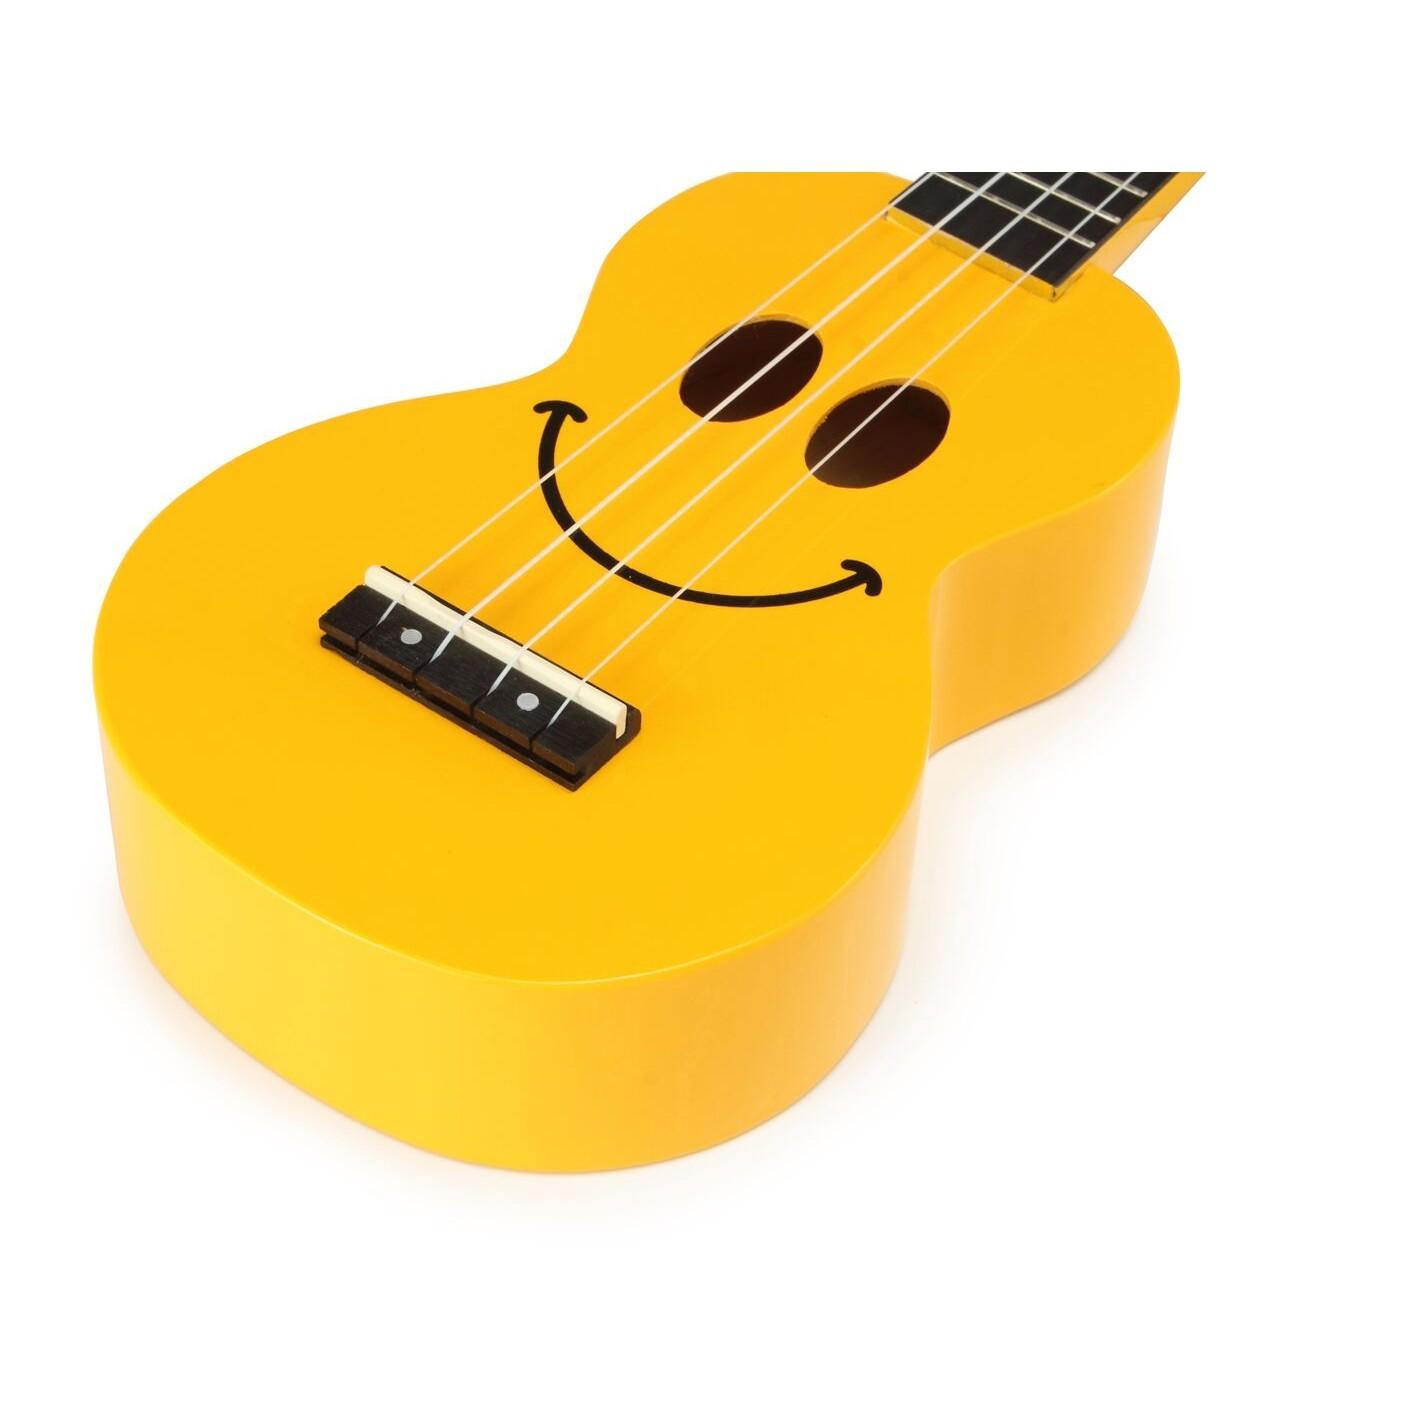 MAHALO U Smile Soprano